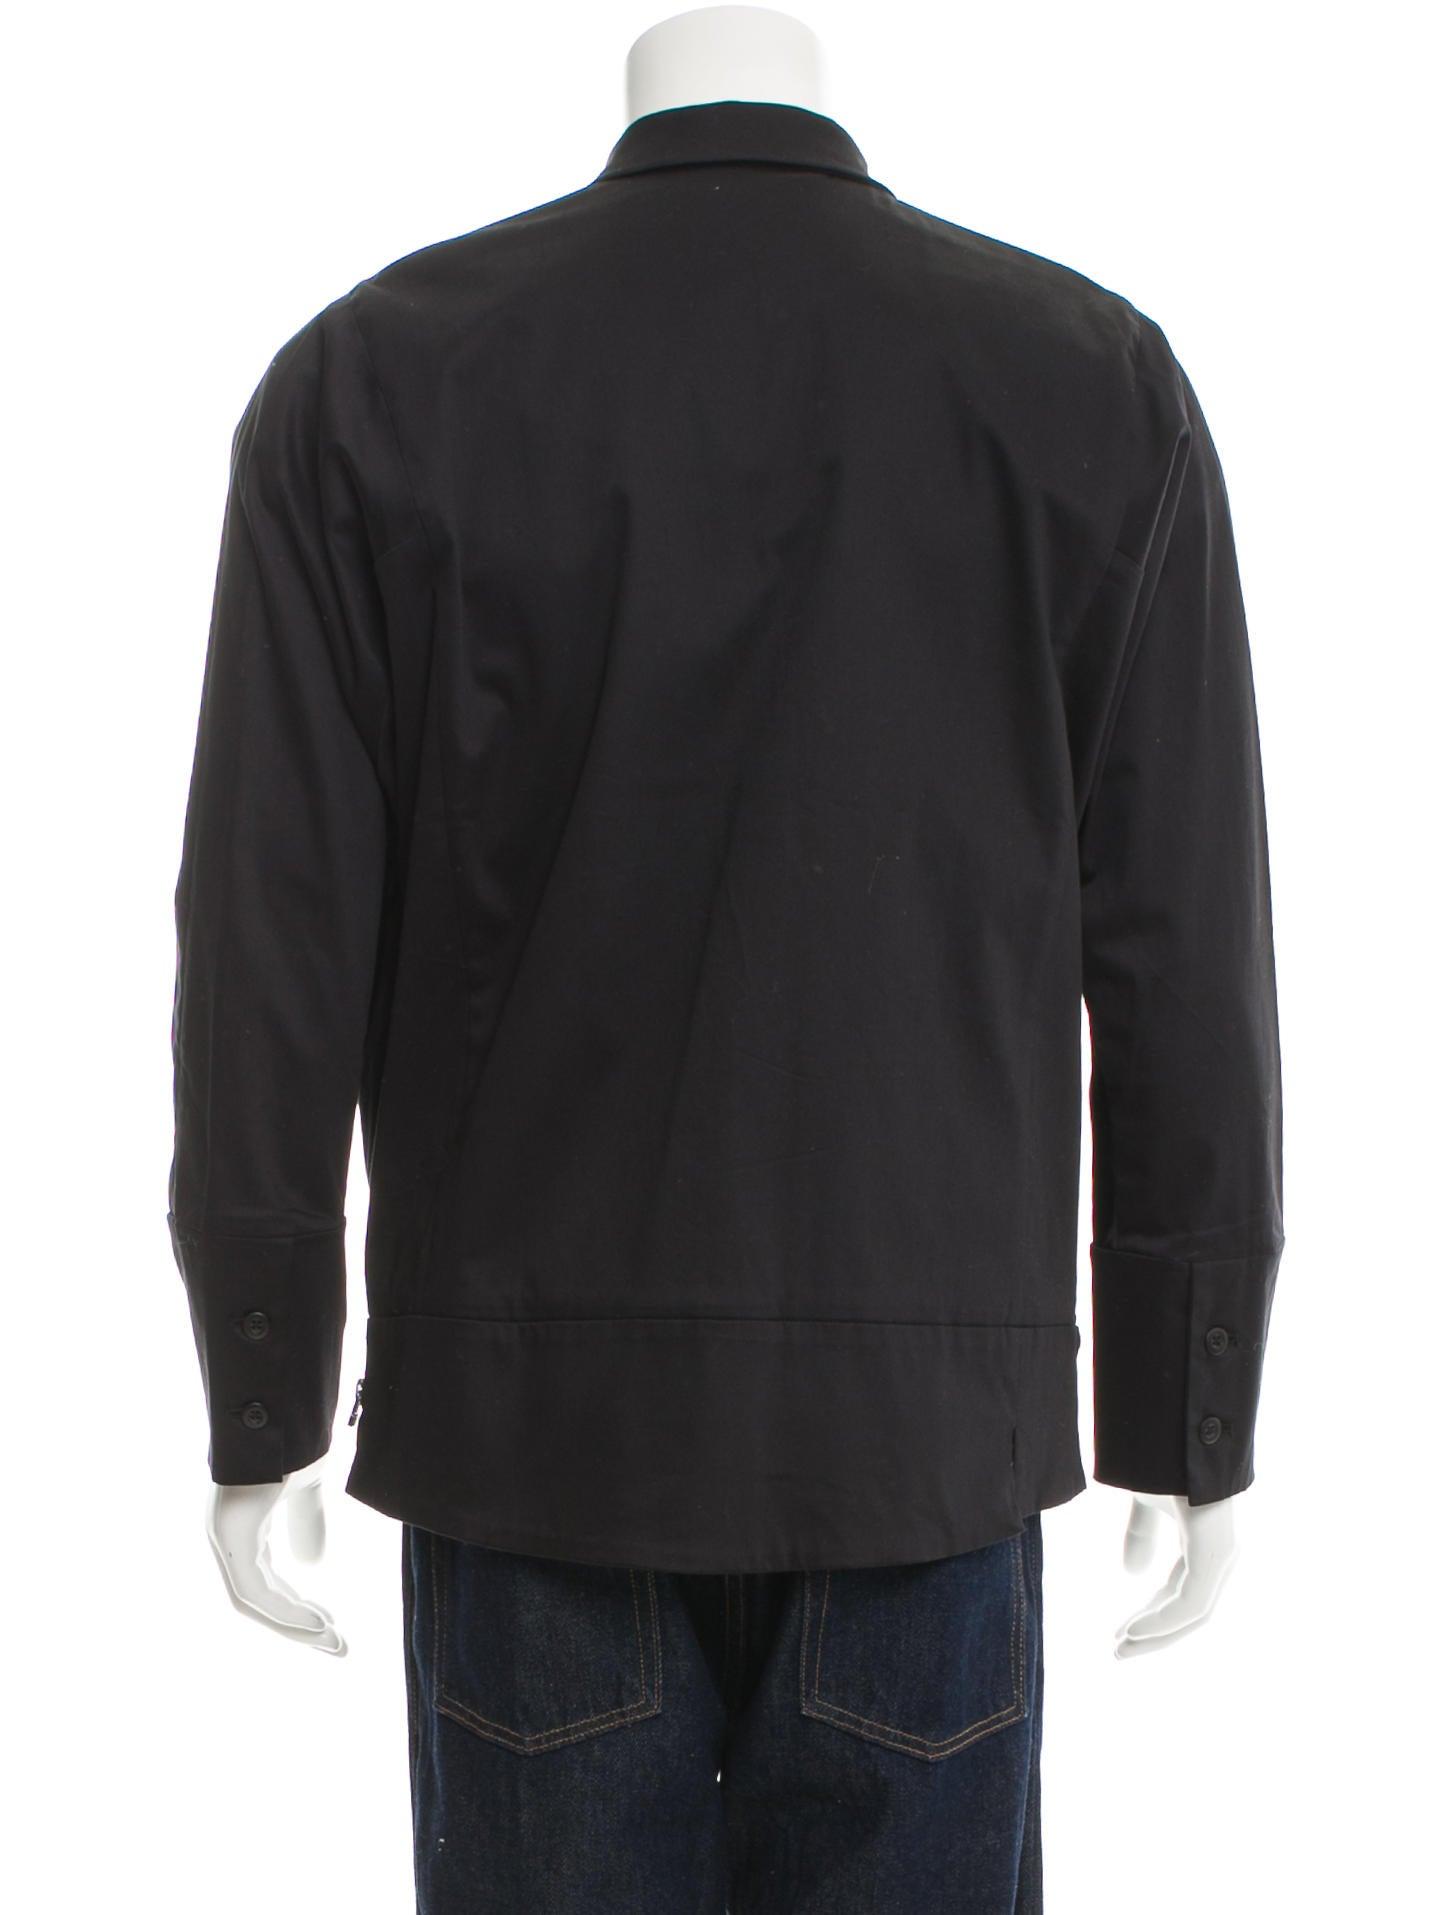 Chapter 2016 Zip Jacket - Clothing - WCHAP20005 | The RealReal